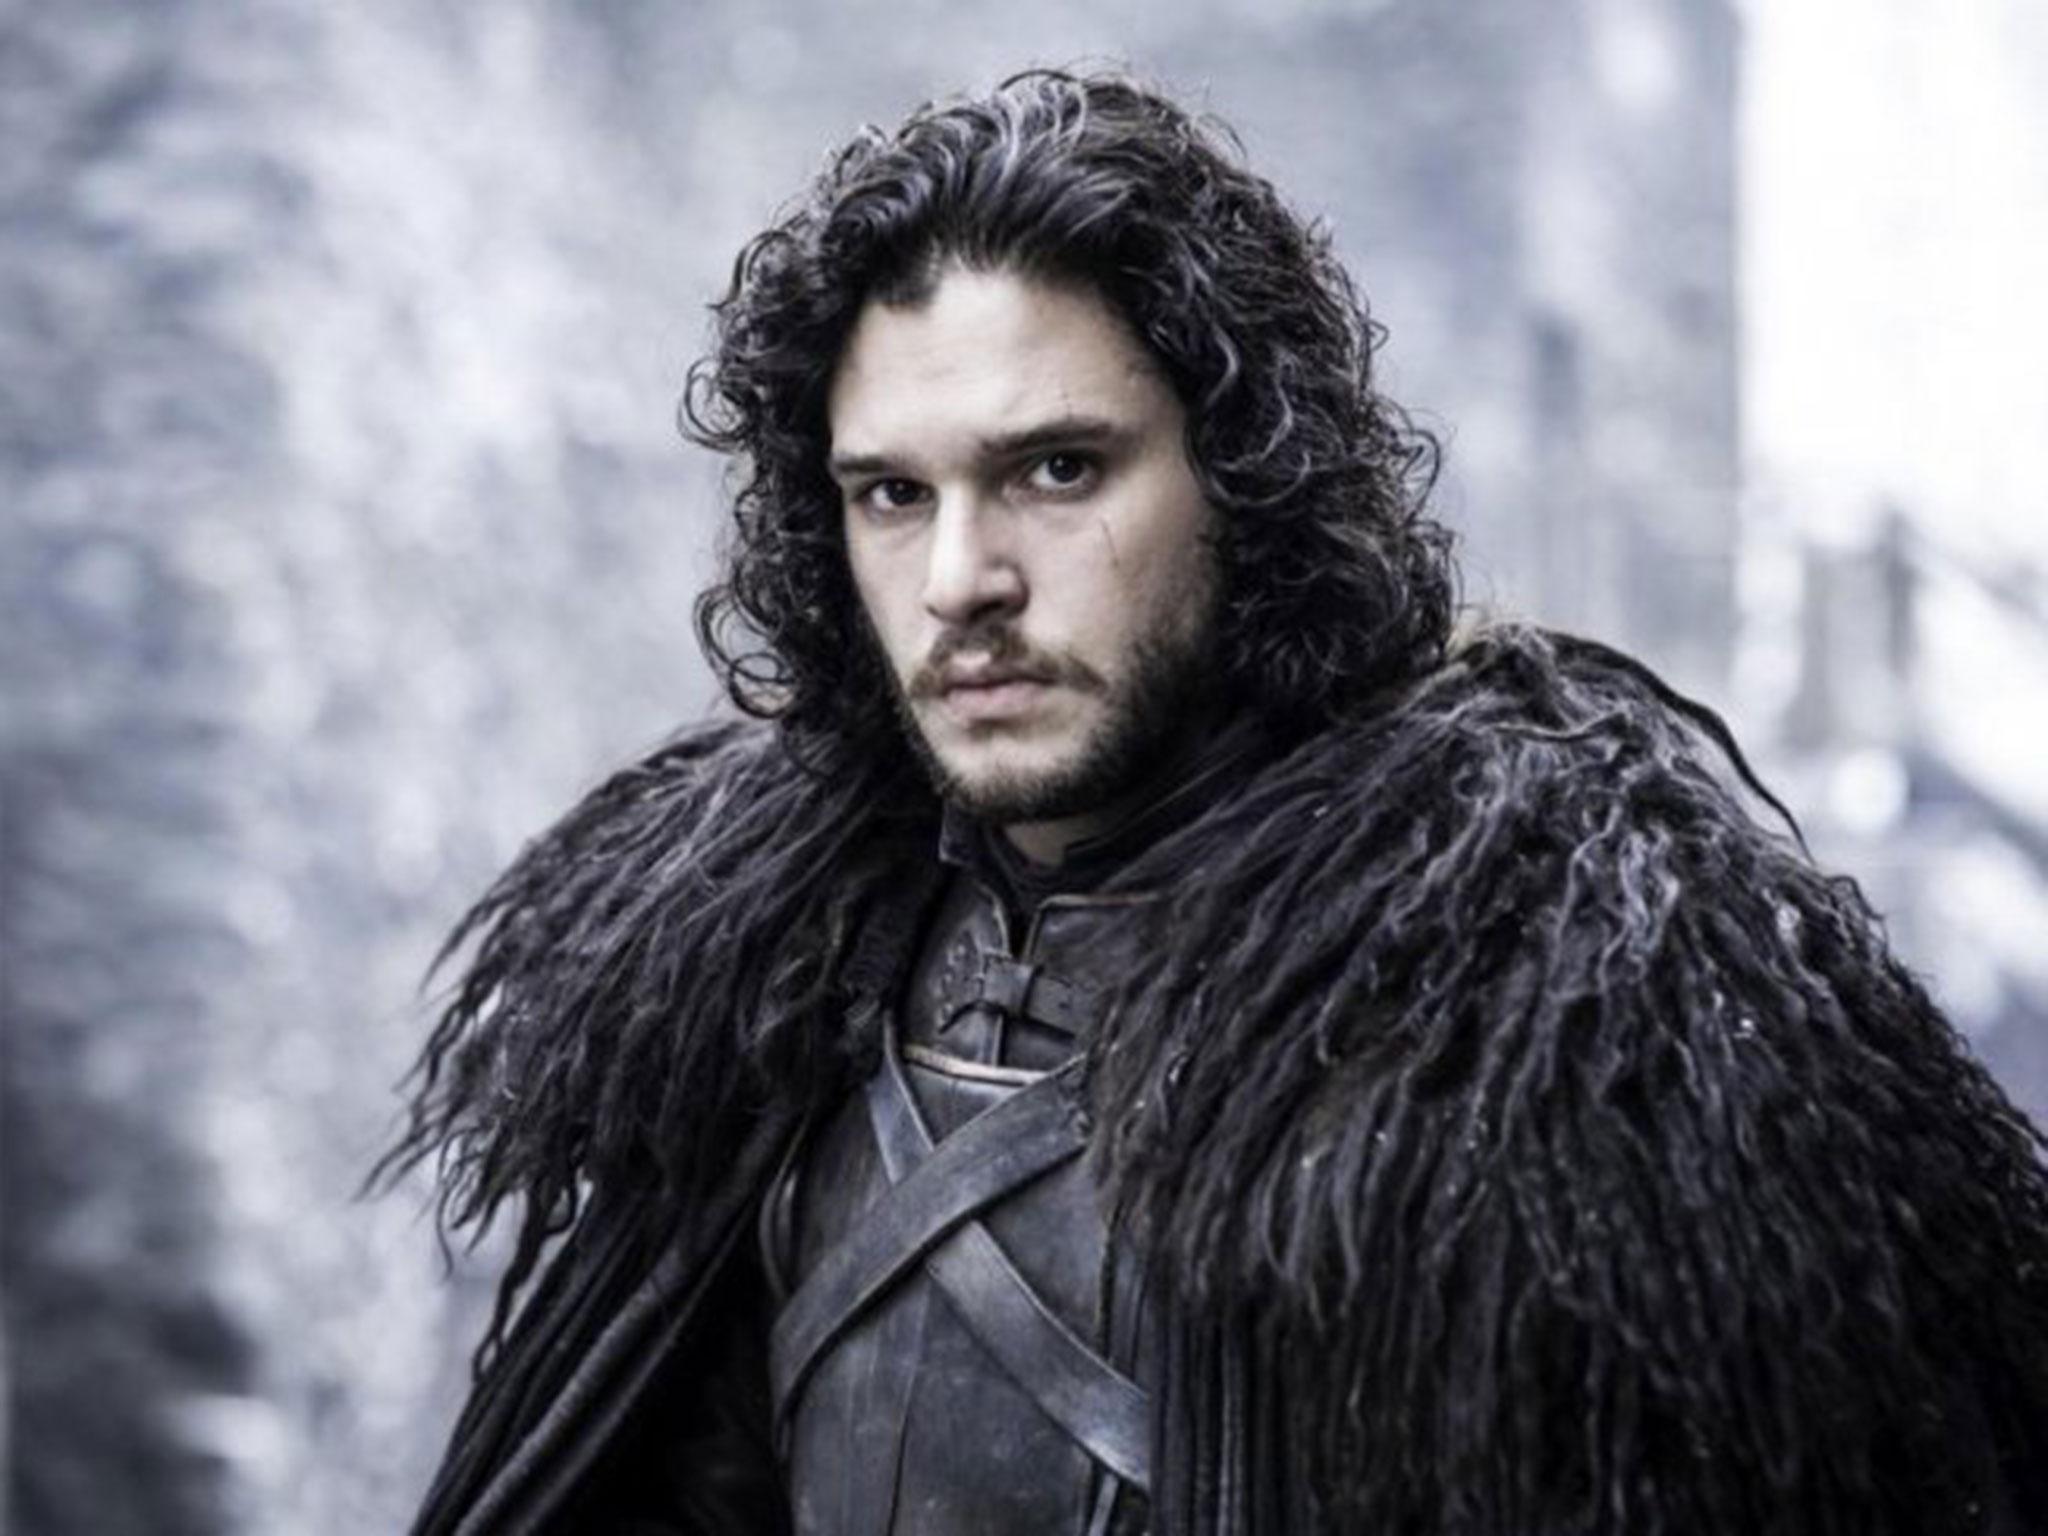 Jon Snow (Foto: The Independent/Reprodução)